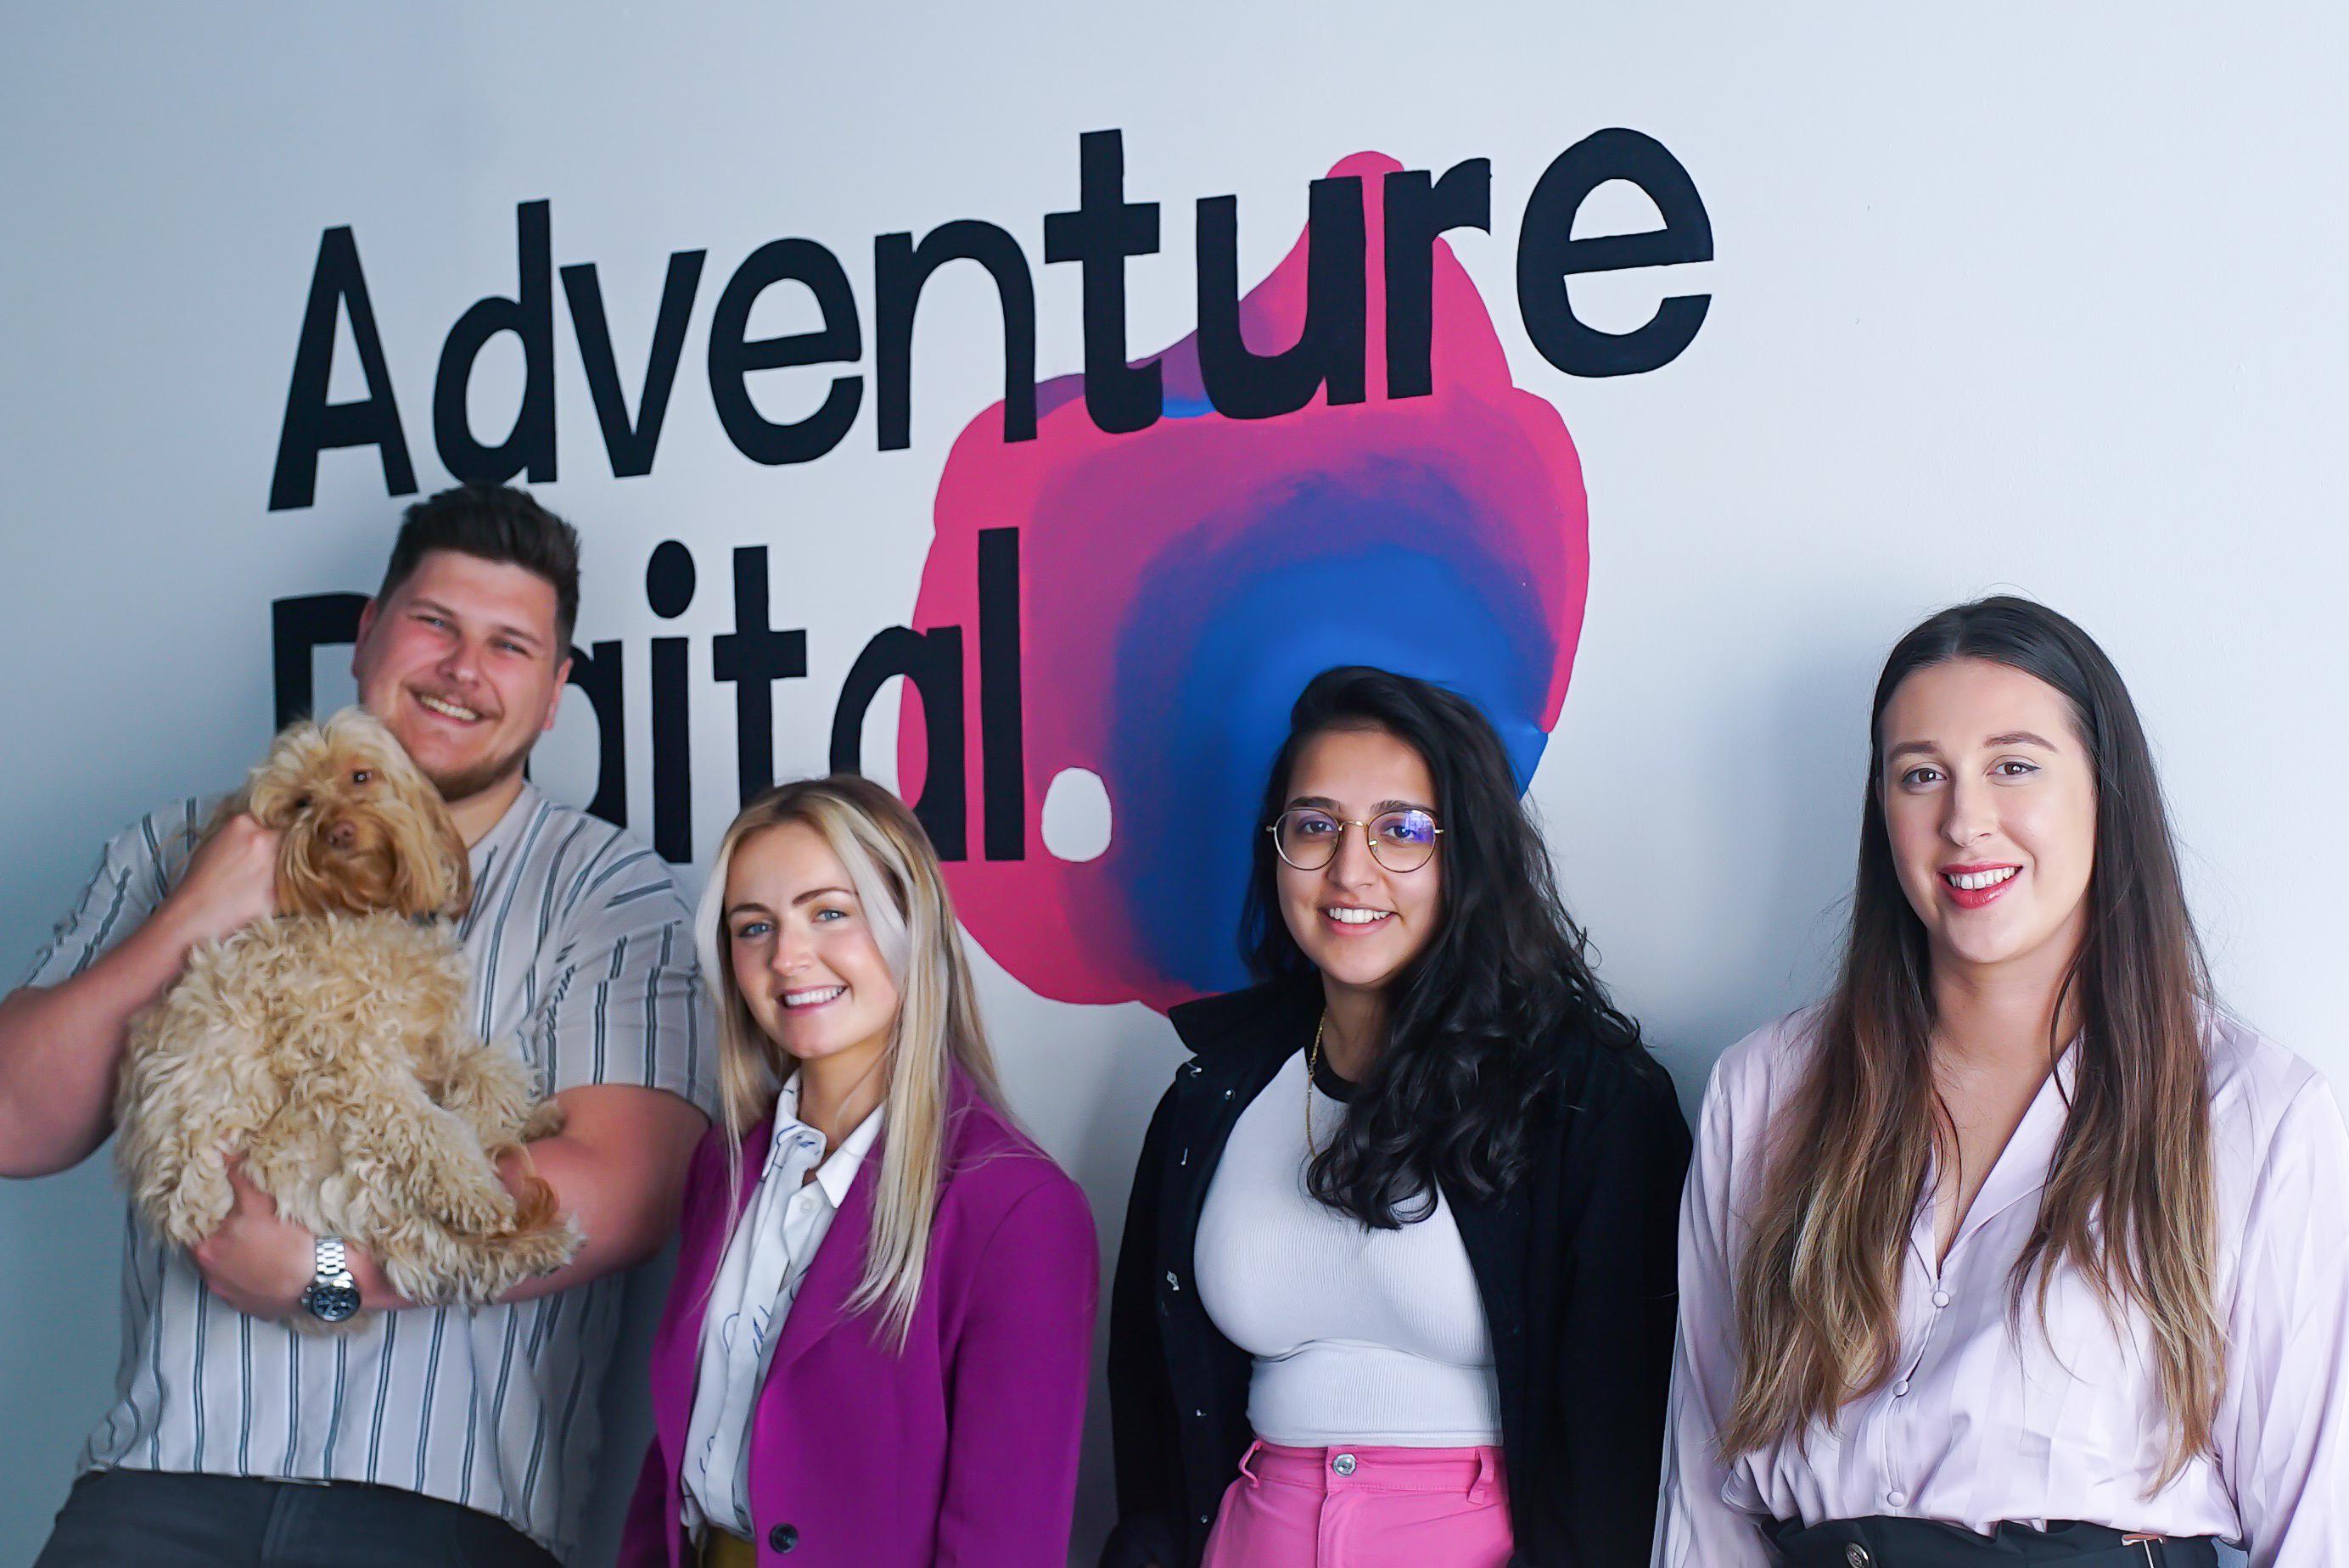 Adventure Digital Marketing Agency Team